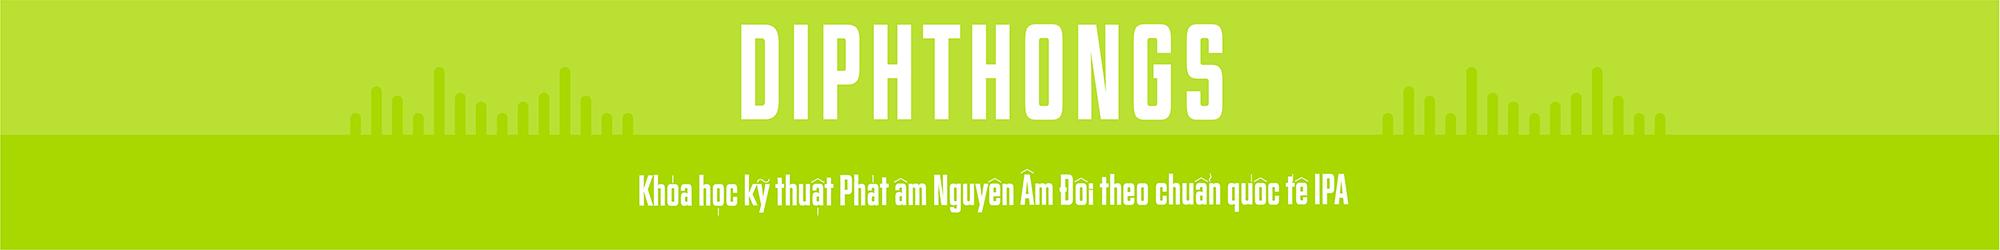 English Pronunciation IPA (Diphthongs) banner